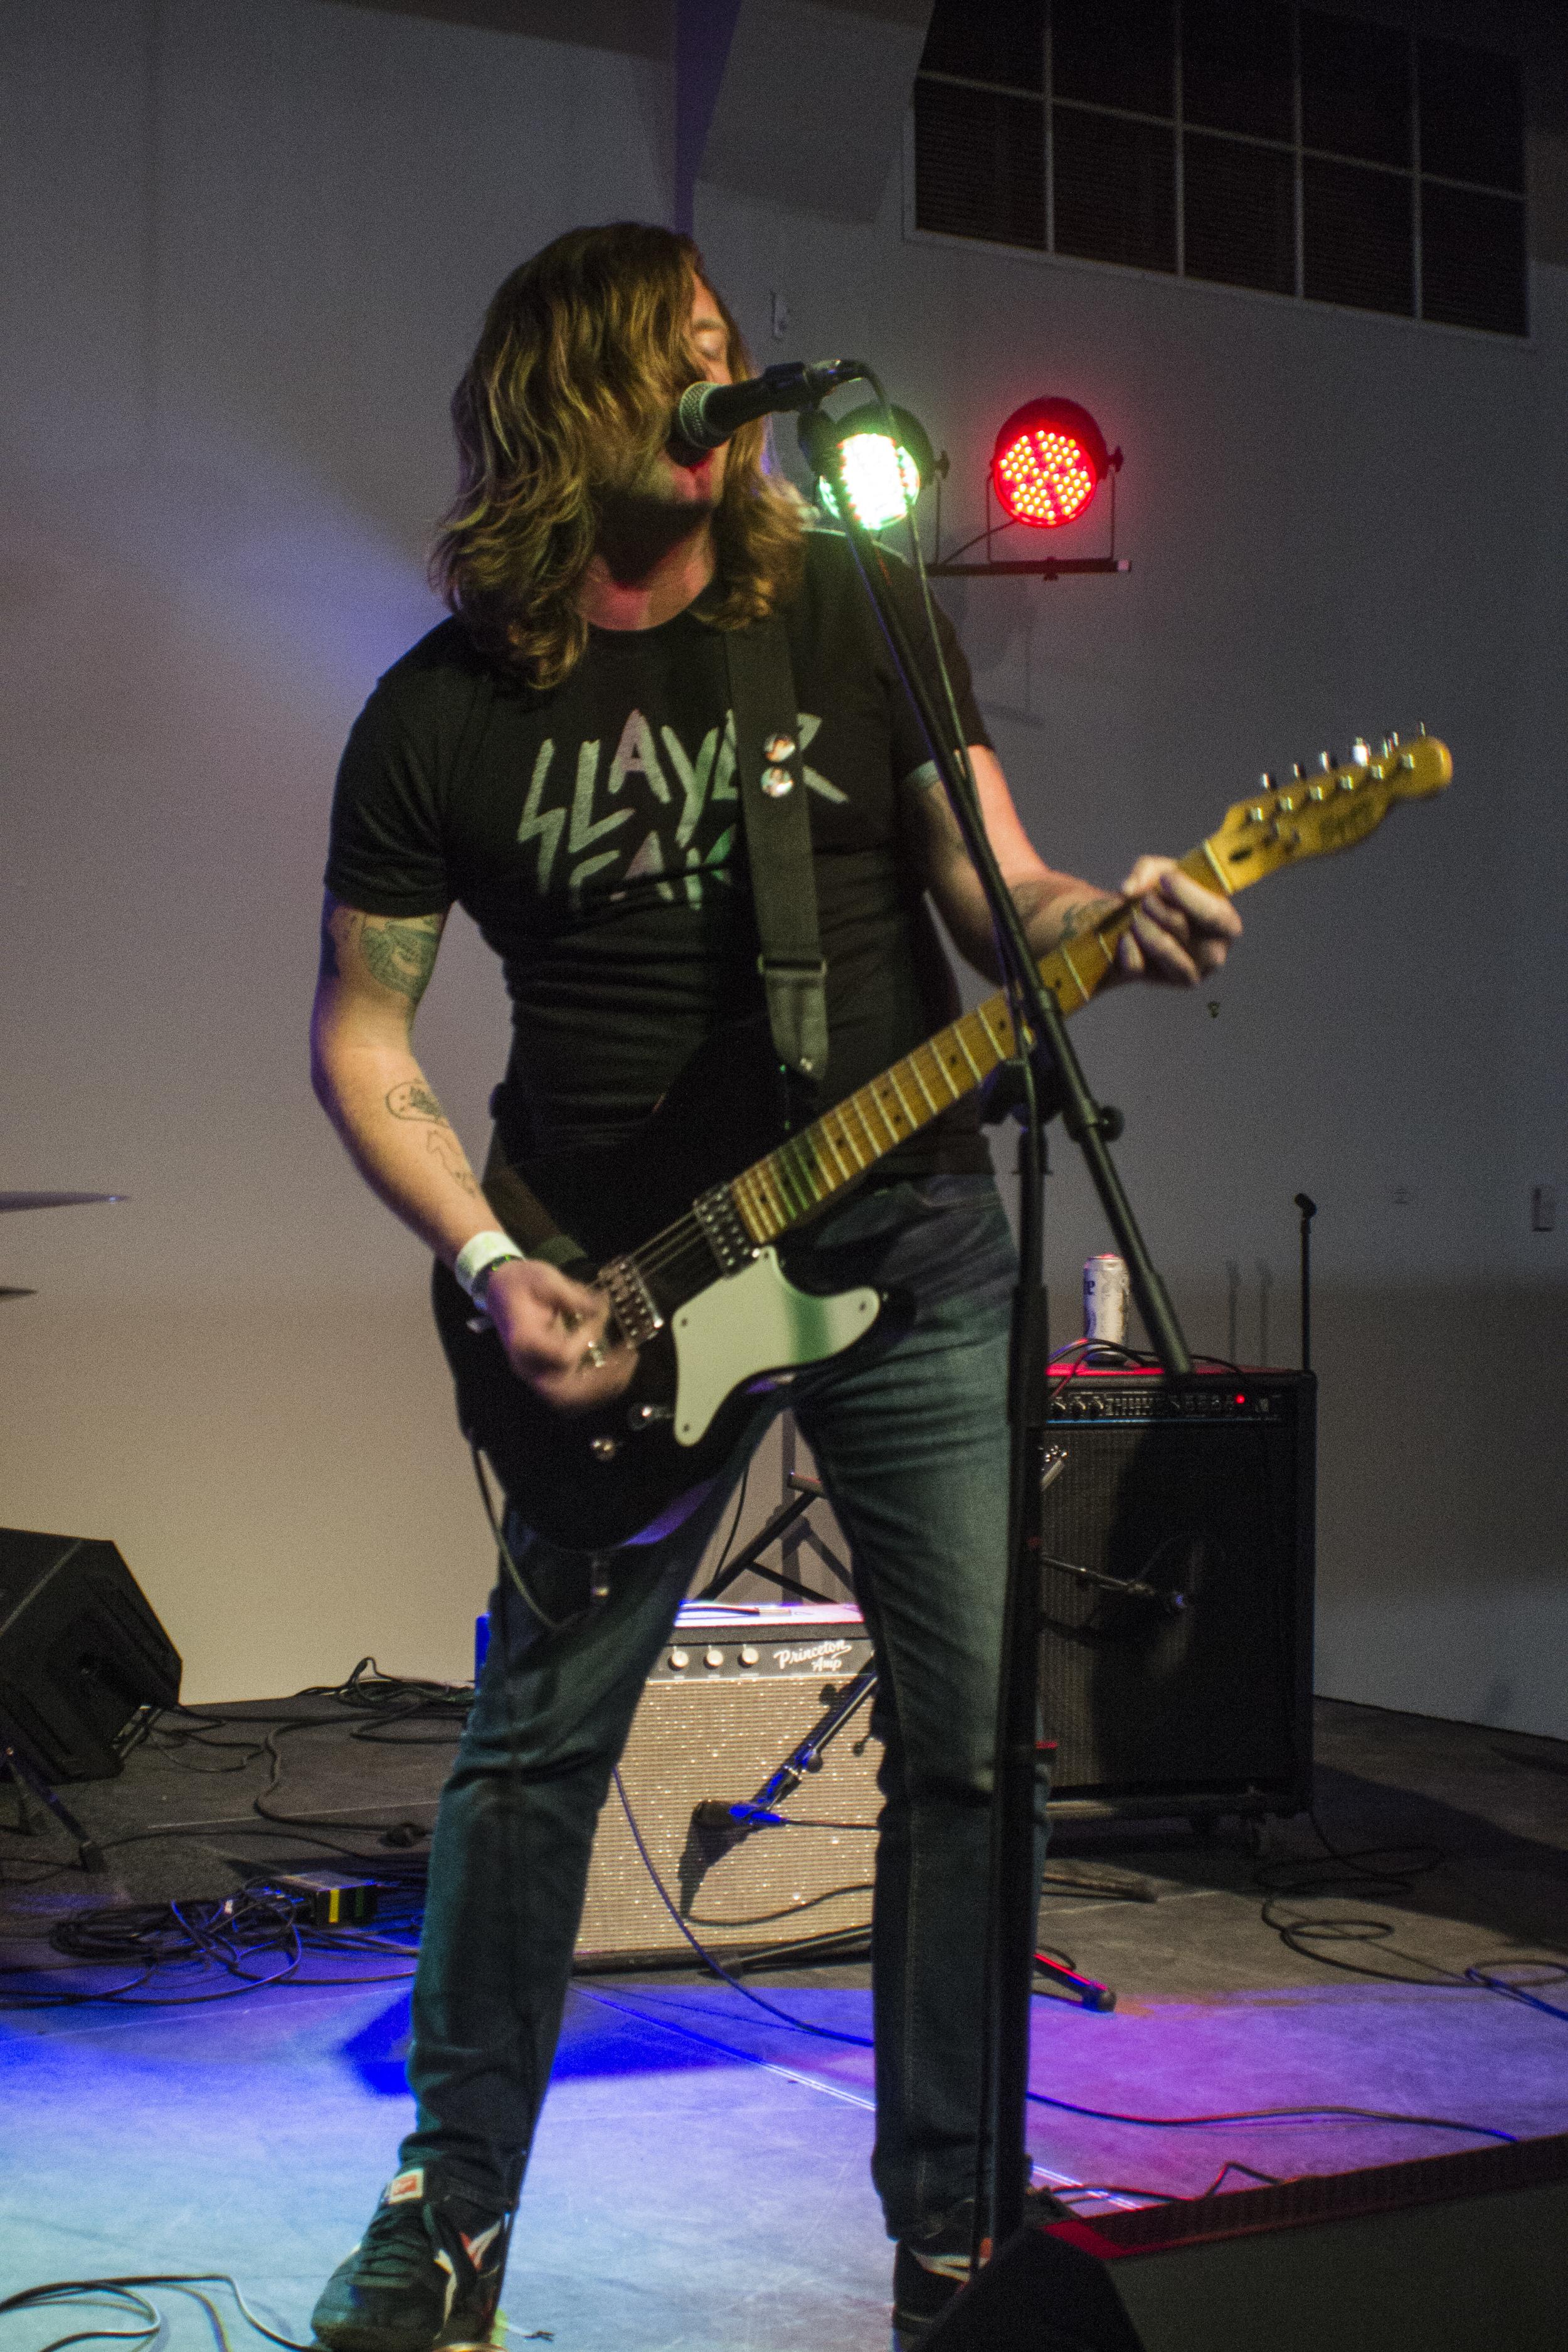 Daniel Markham at Greater Denton Arts Council. Photo by  Cynthia Pantaleon.